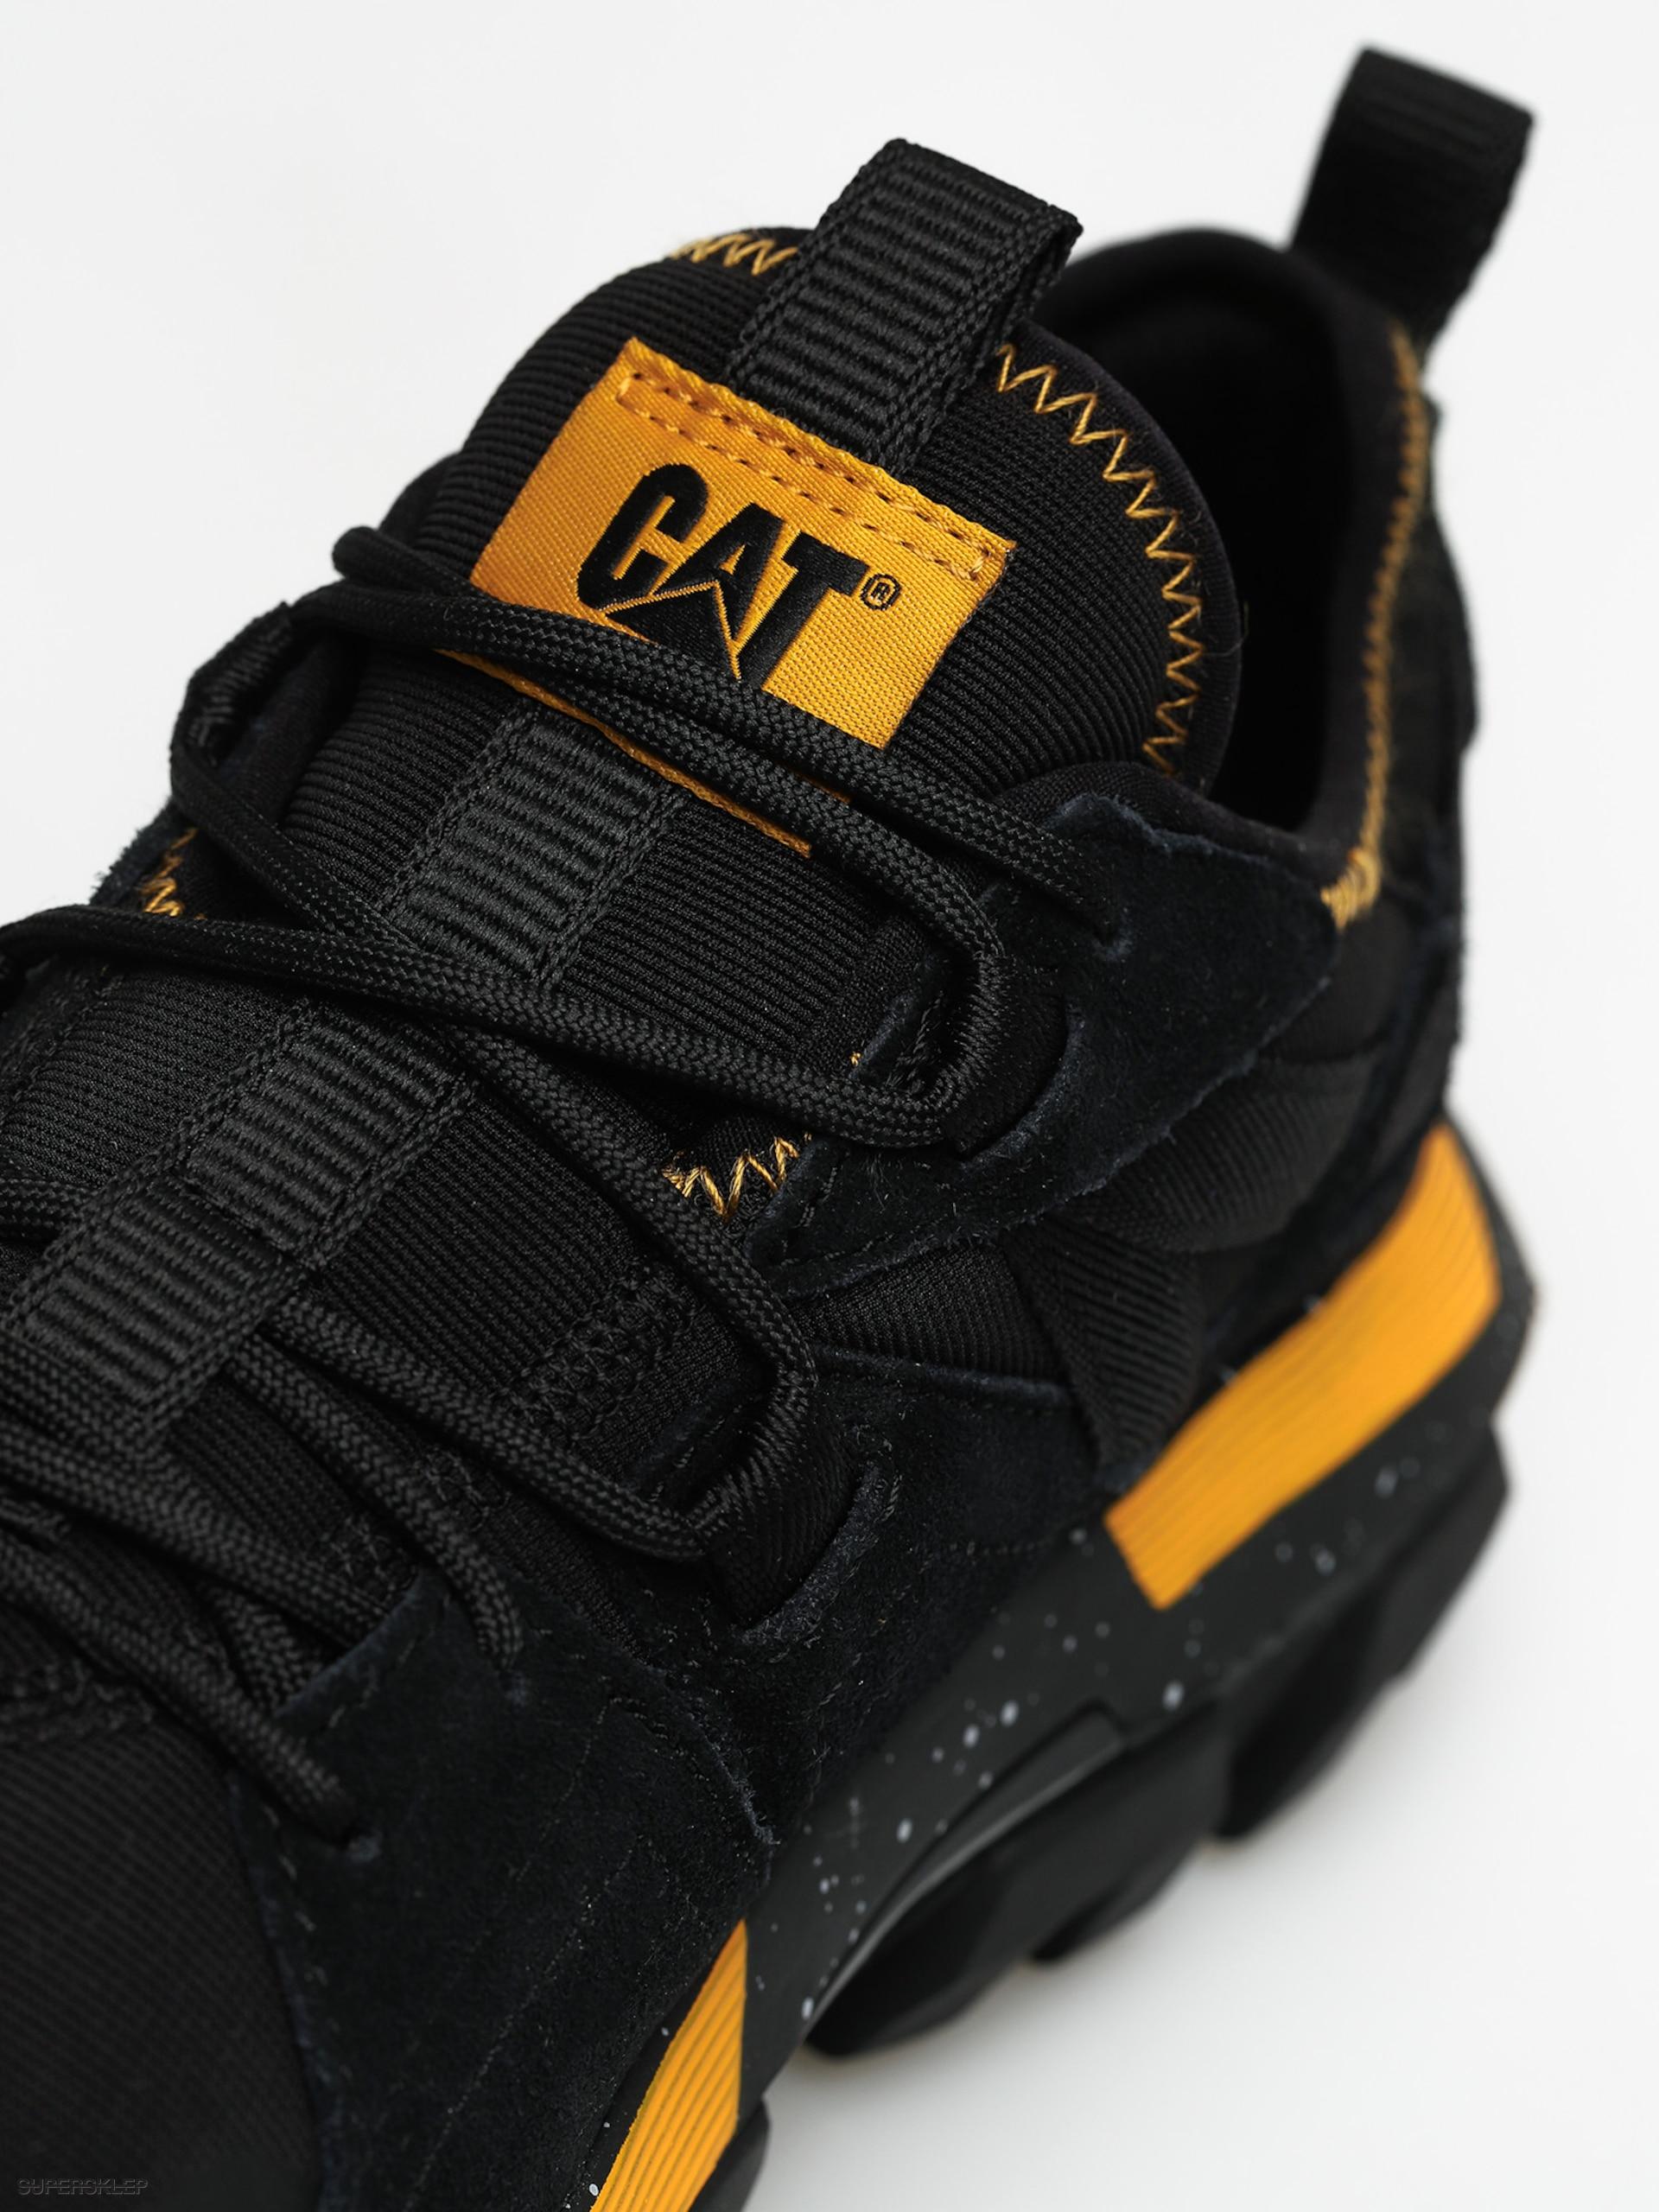 Buty Caterpillar Raider Sport (blackcat yellow)